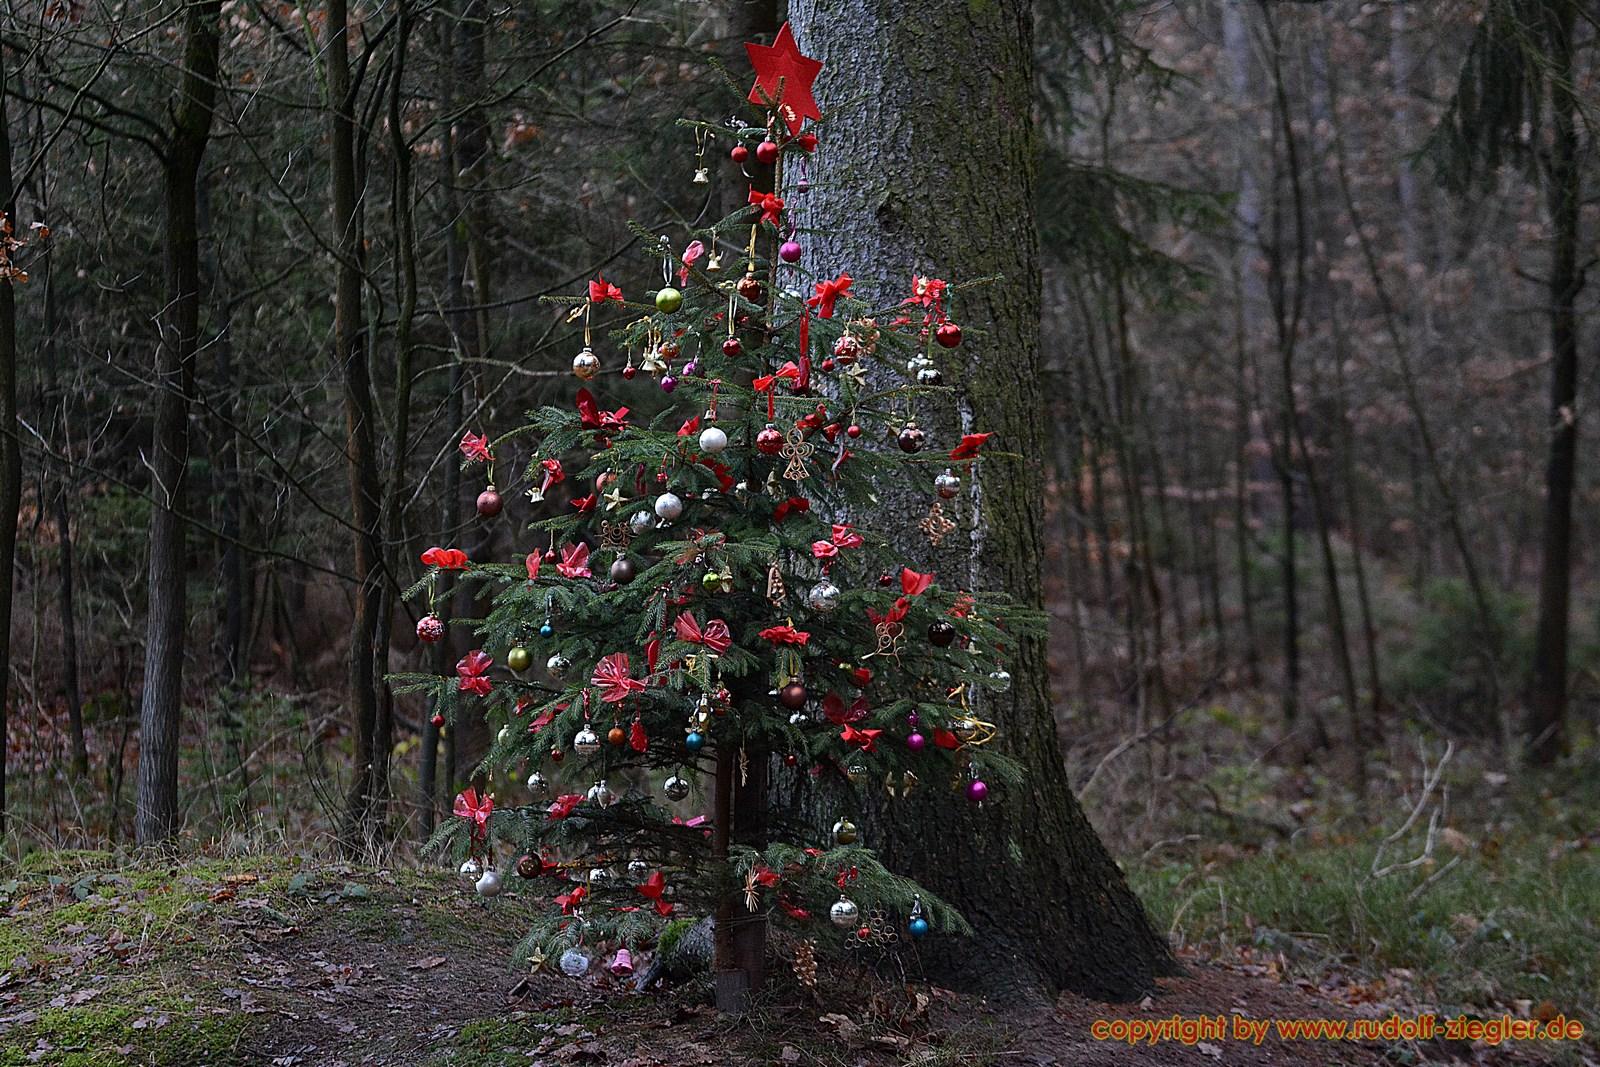 Weihnachtsbaum am TRIMM-DICH-PFAD Bayreuth 016-S - 1600x1200